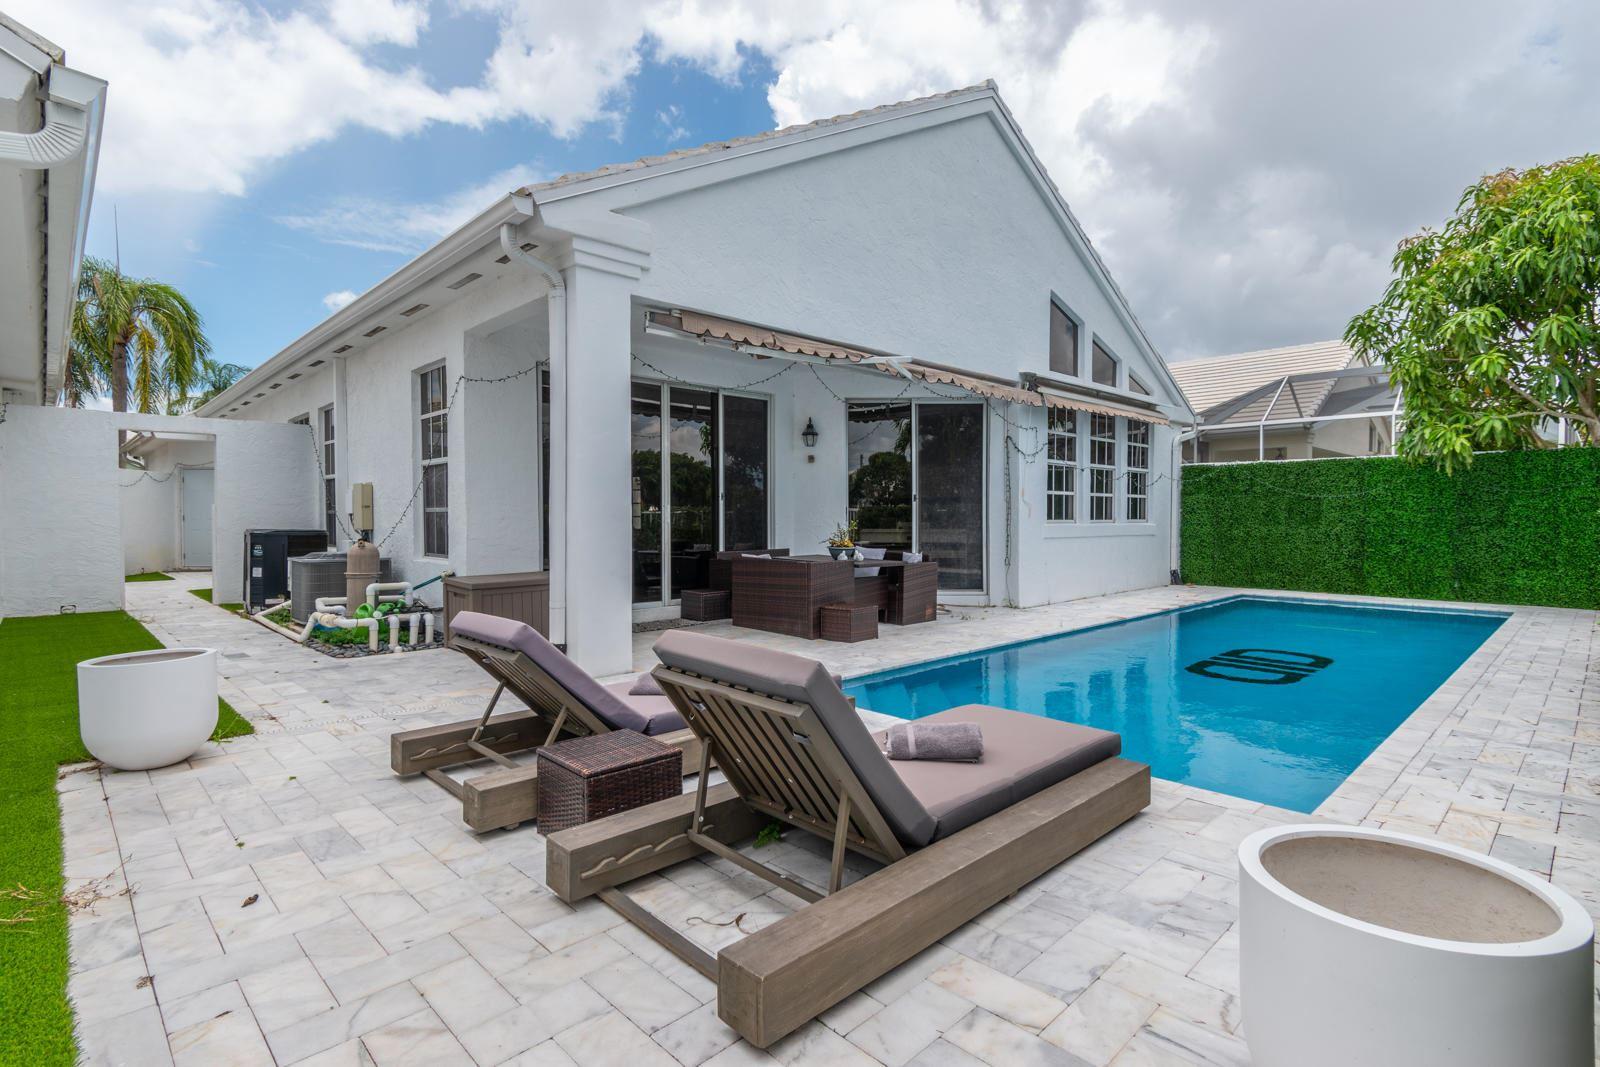 1040 Lytham Court, West Palm Beach, FL 33411 - MLS#: RX-10728636